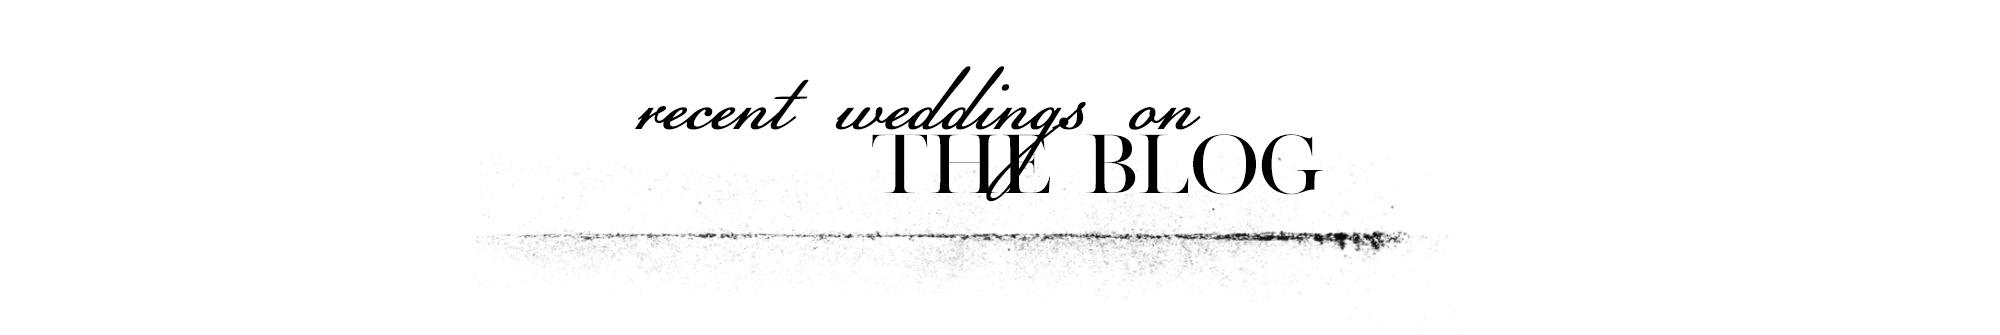 recent weddings on the blog header image.jpg